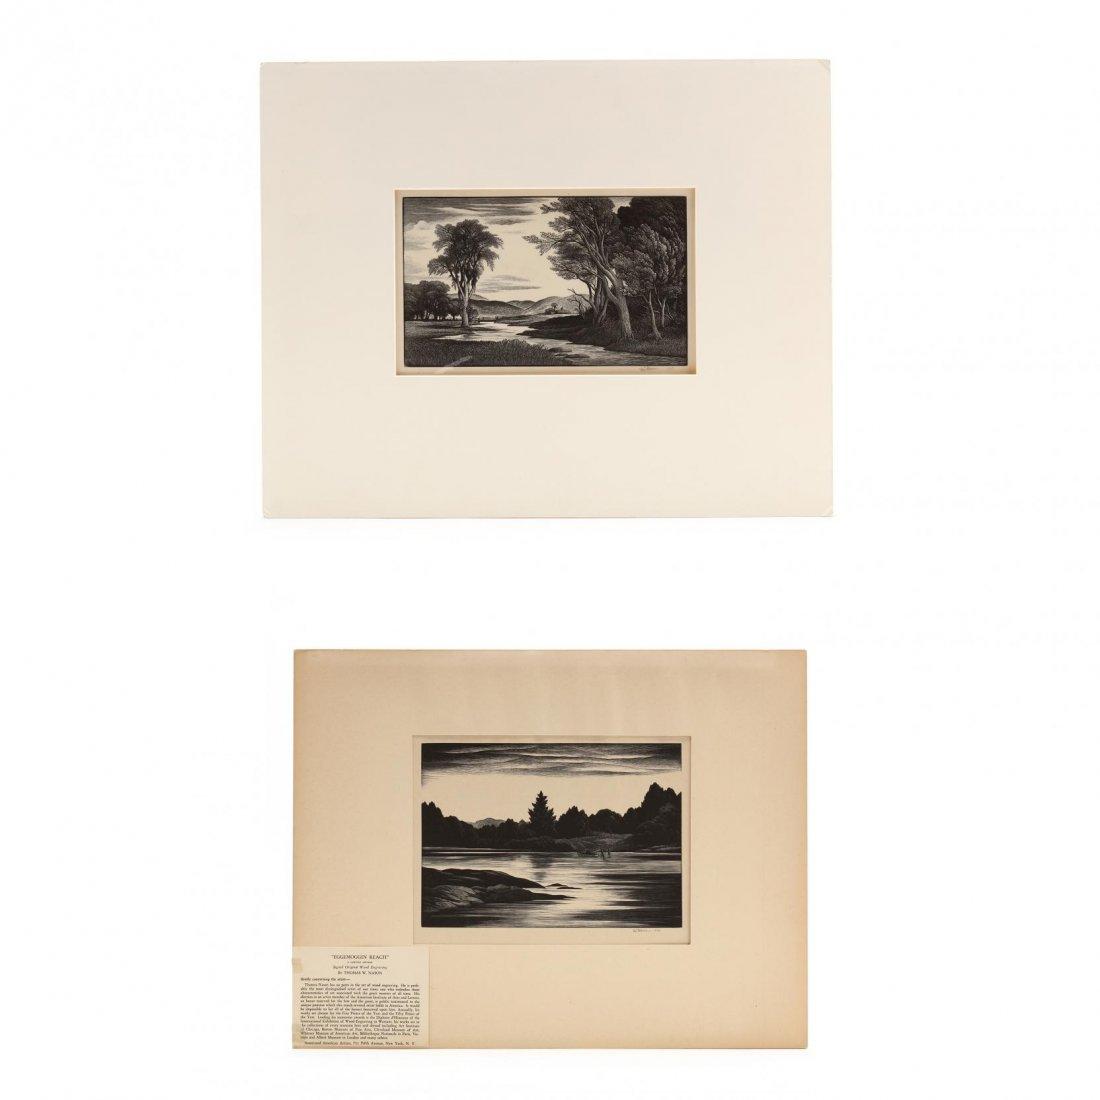 Thomas Willoughby Nason (American, 1889-1971), Two New